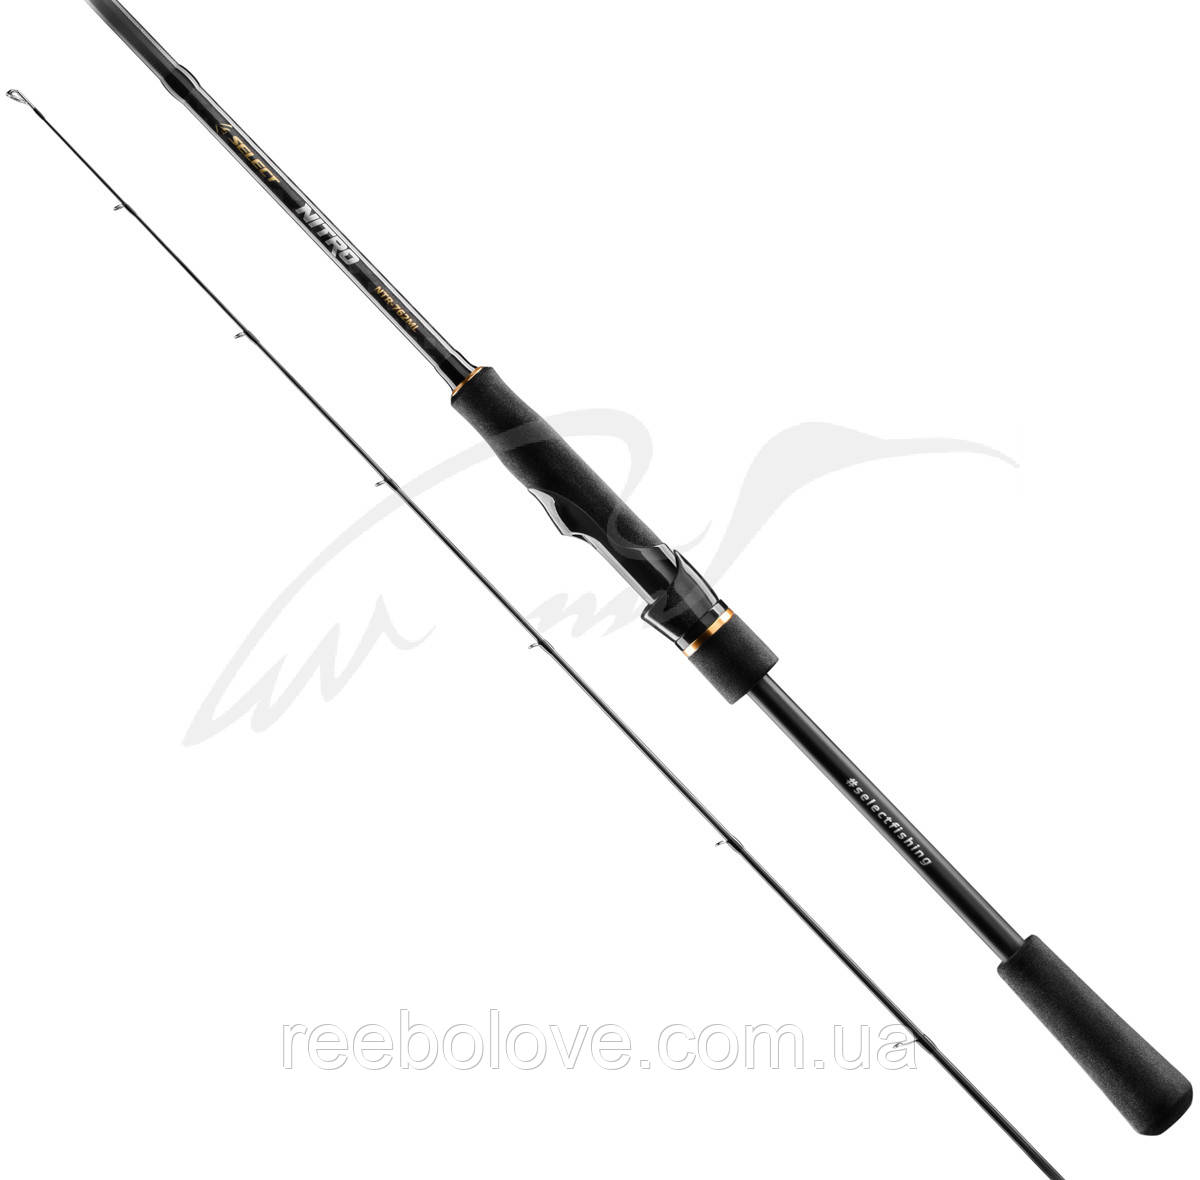 Спінінг Select Nitro NTR-662MH 1.98 m 7-28g Fast